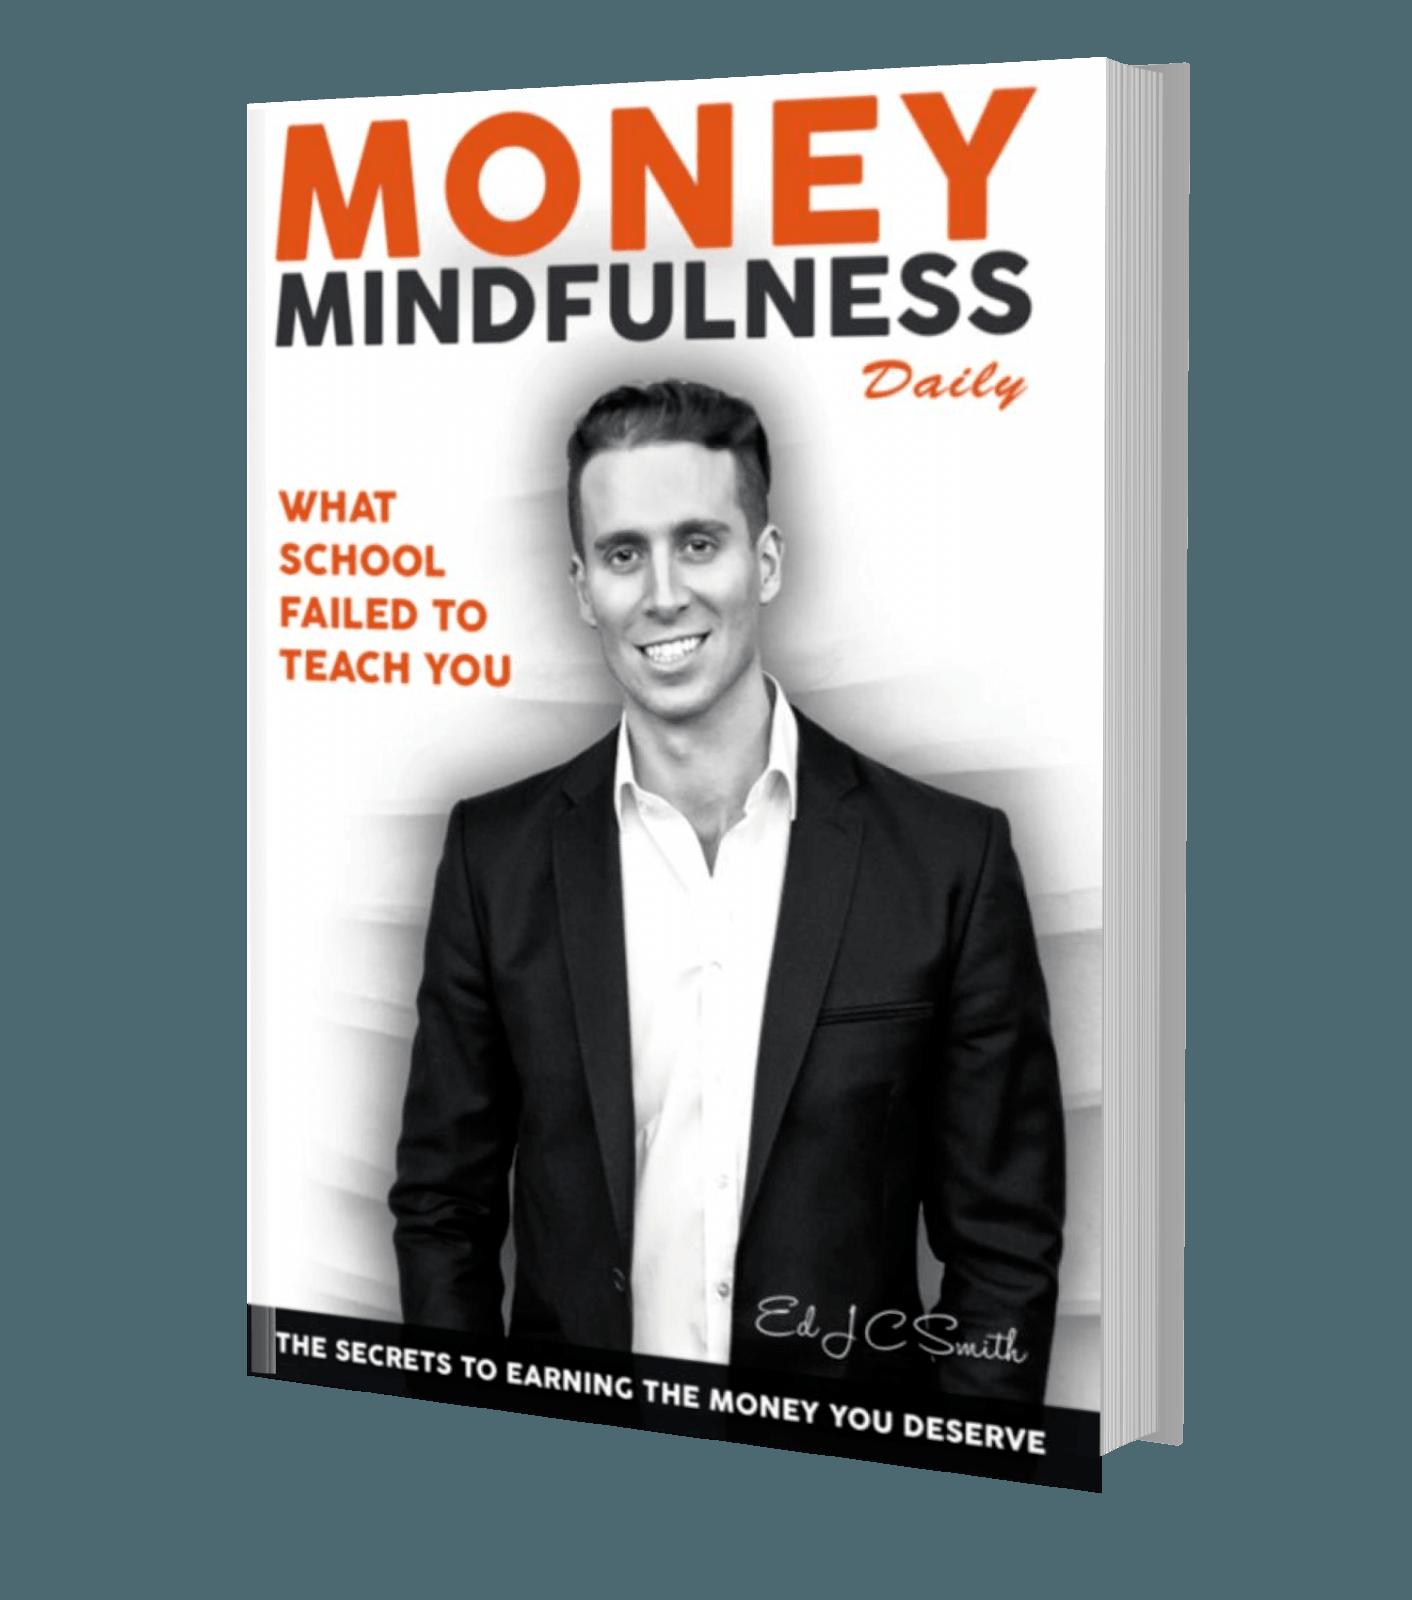 money mindfulness book